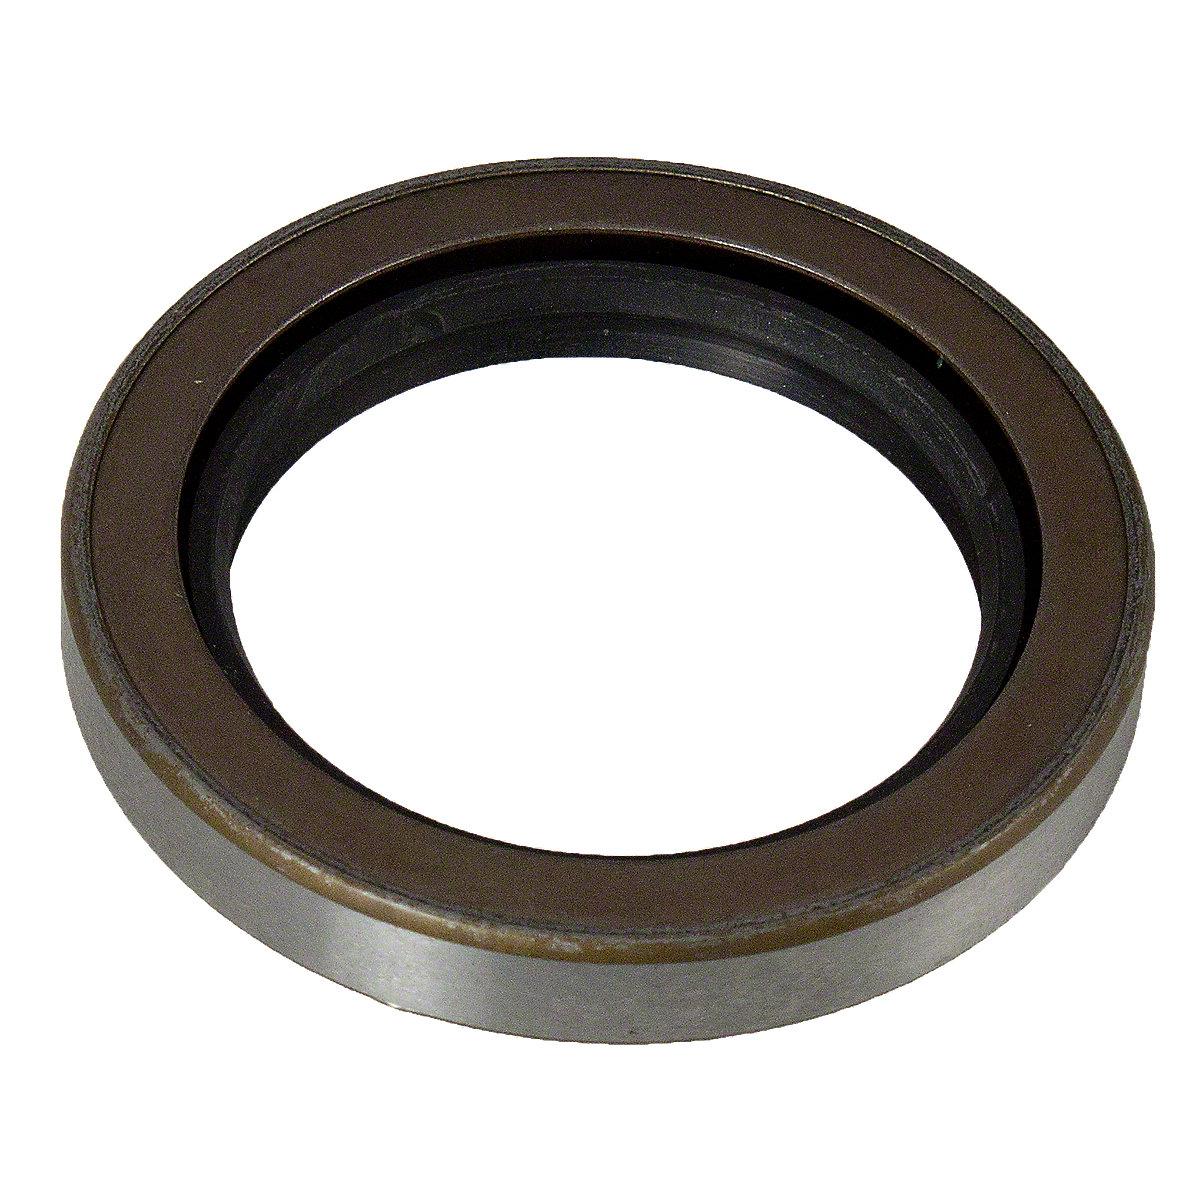 Front Crank Shaft Seal For Massey Ferguson: 65, 85, 88, 165, 175, 180, Super 90, Massey Harris: 33, 44, 333, 444, 44 Special, 55, 555.